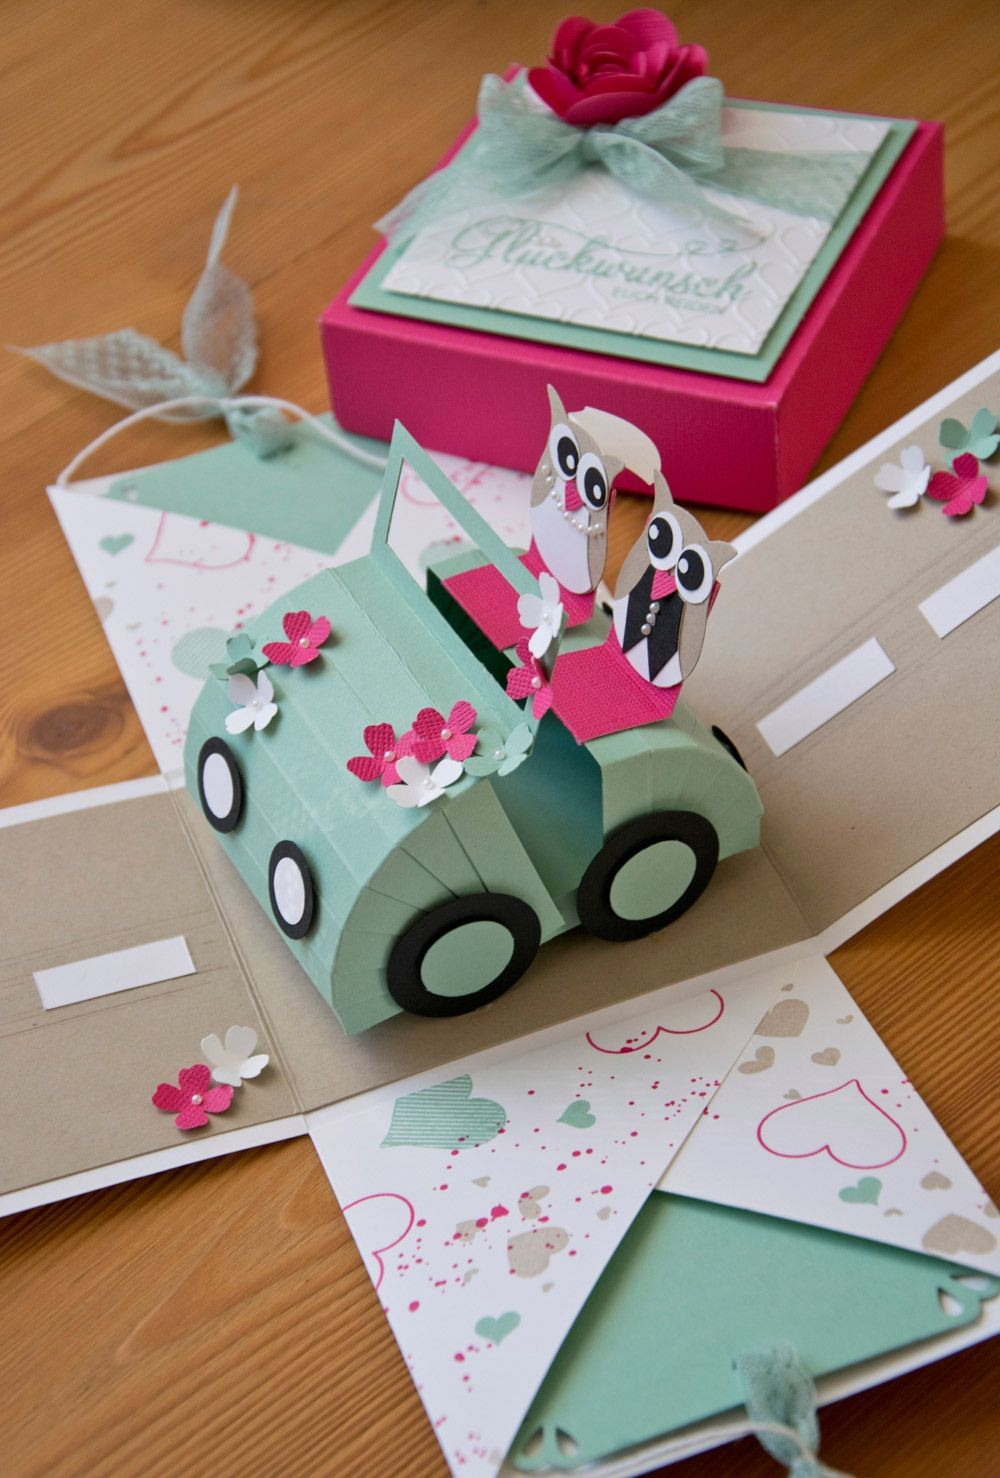 Birthday Cake Papercraft Hochzeits Explosionsbox Okulöncesi Etkinlik